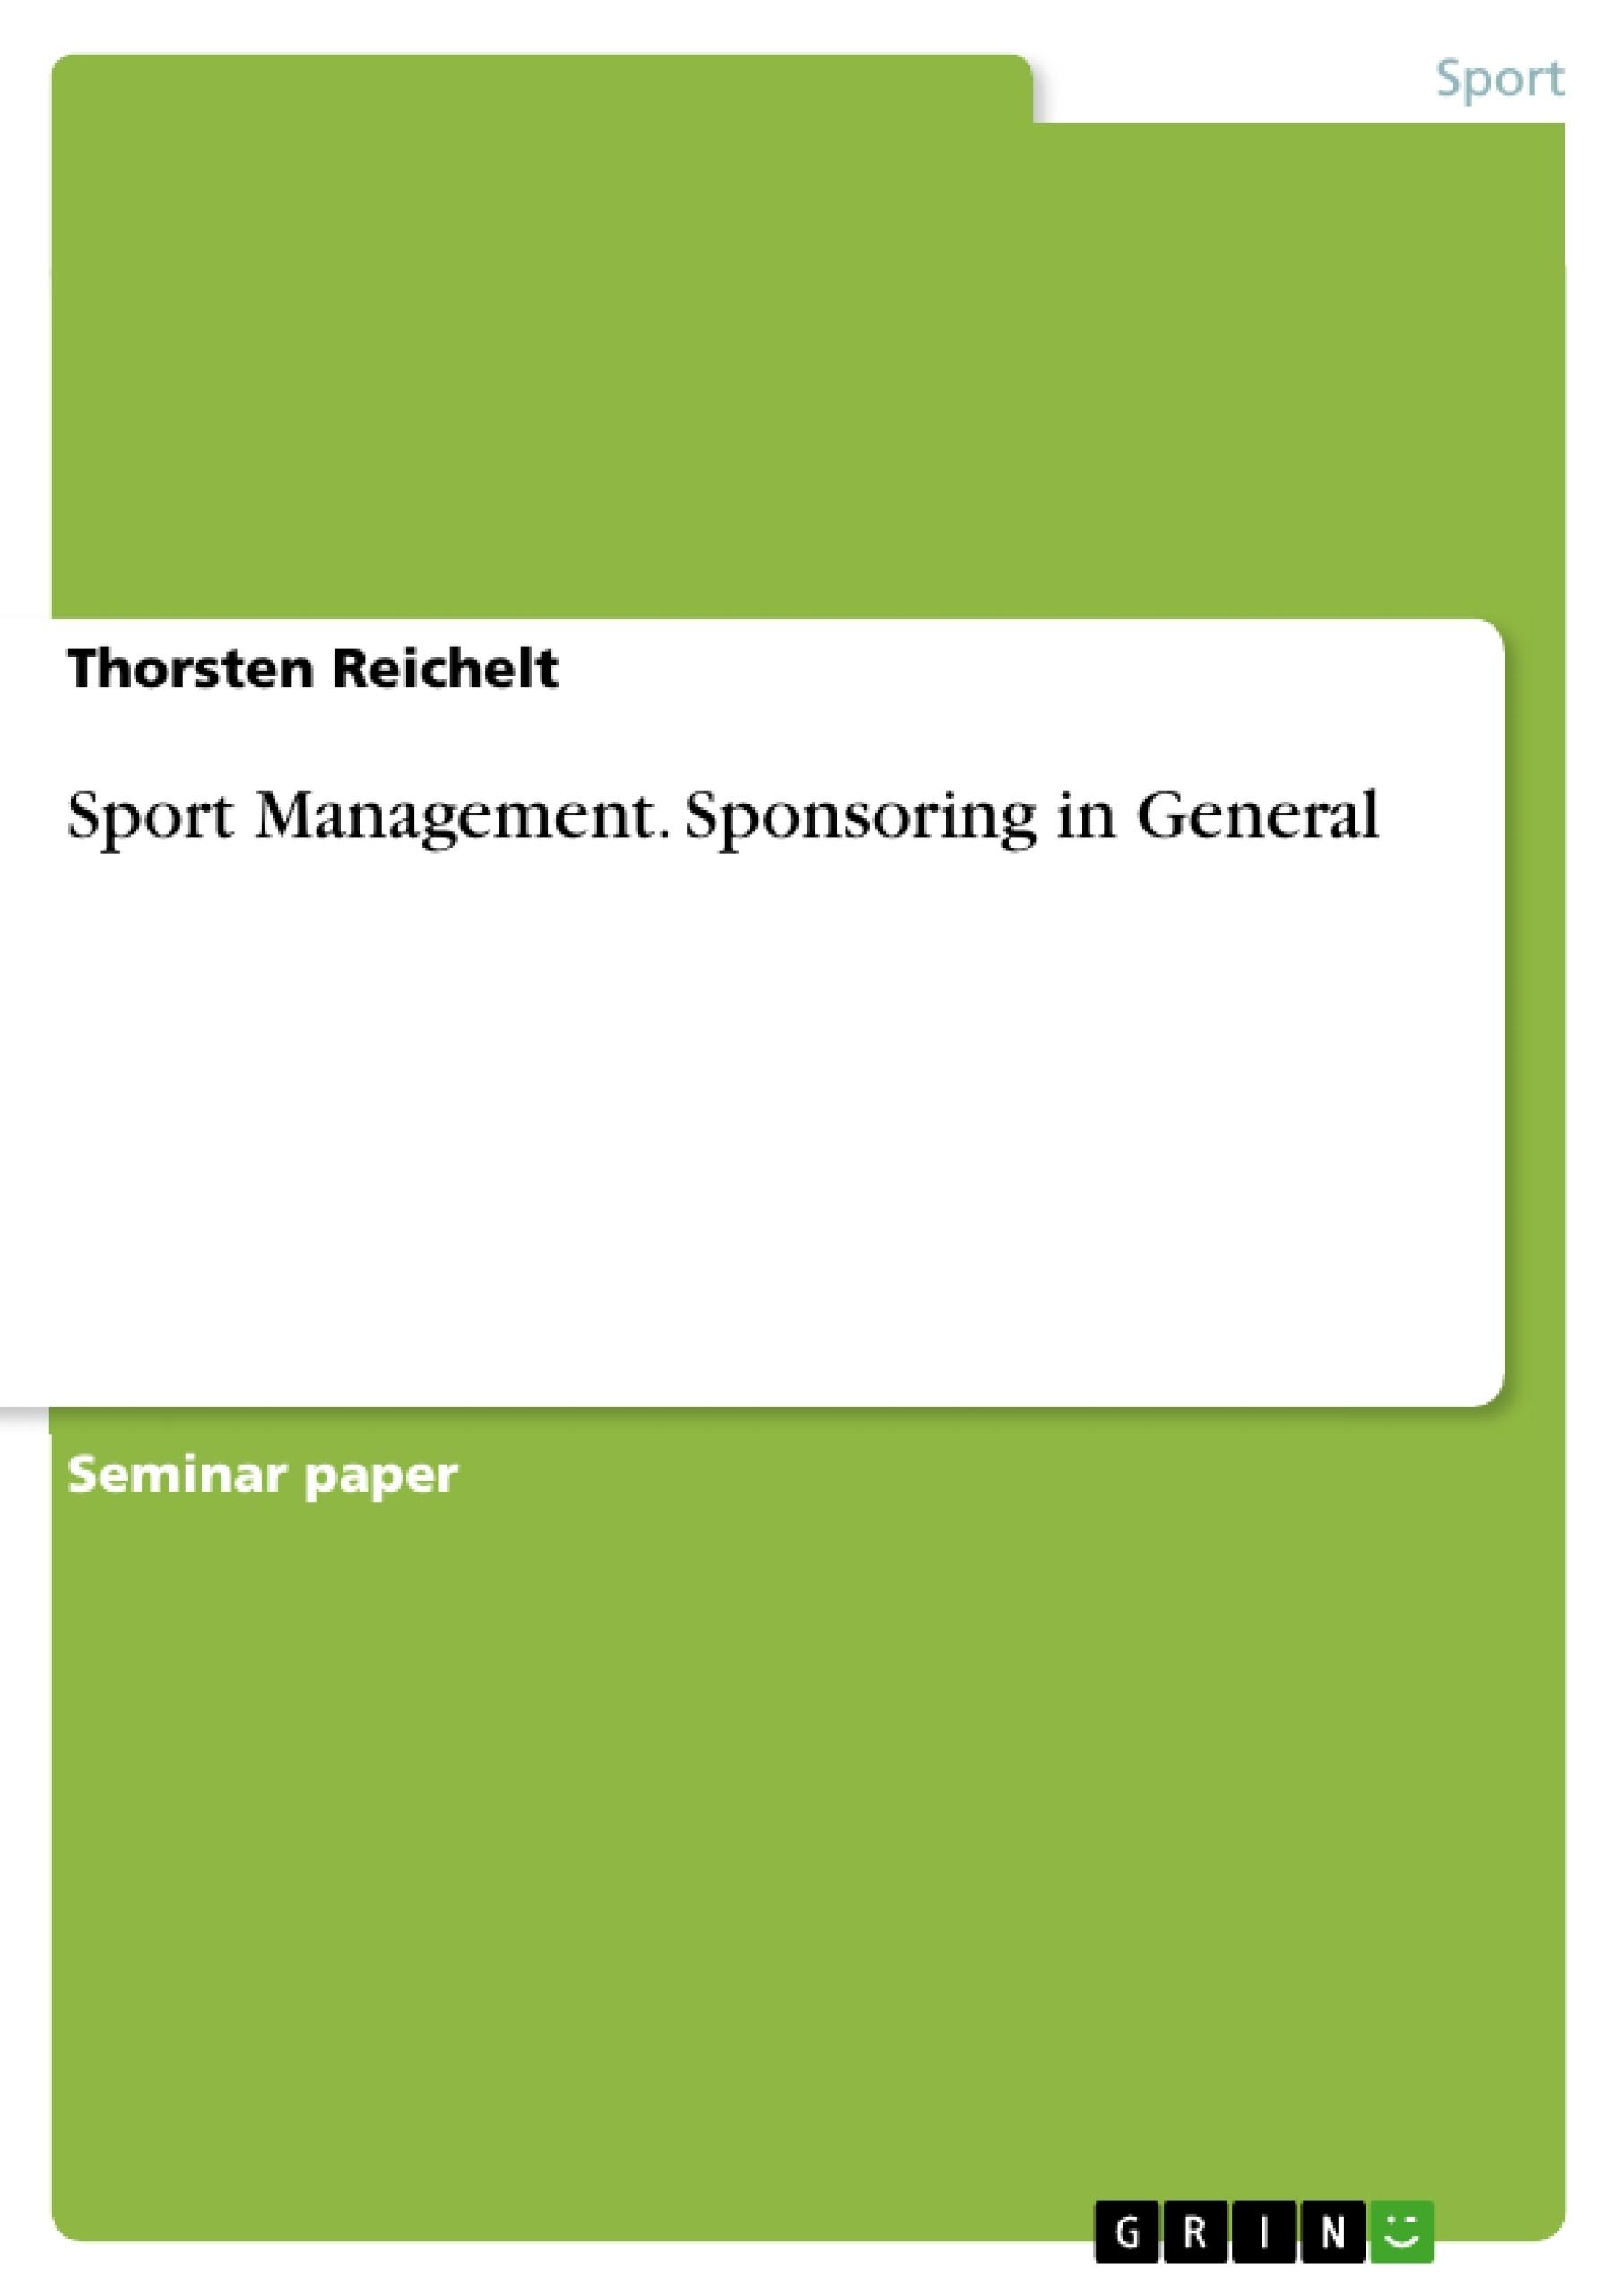 Sport management dissertation